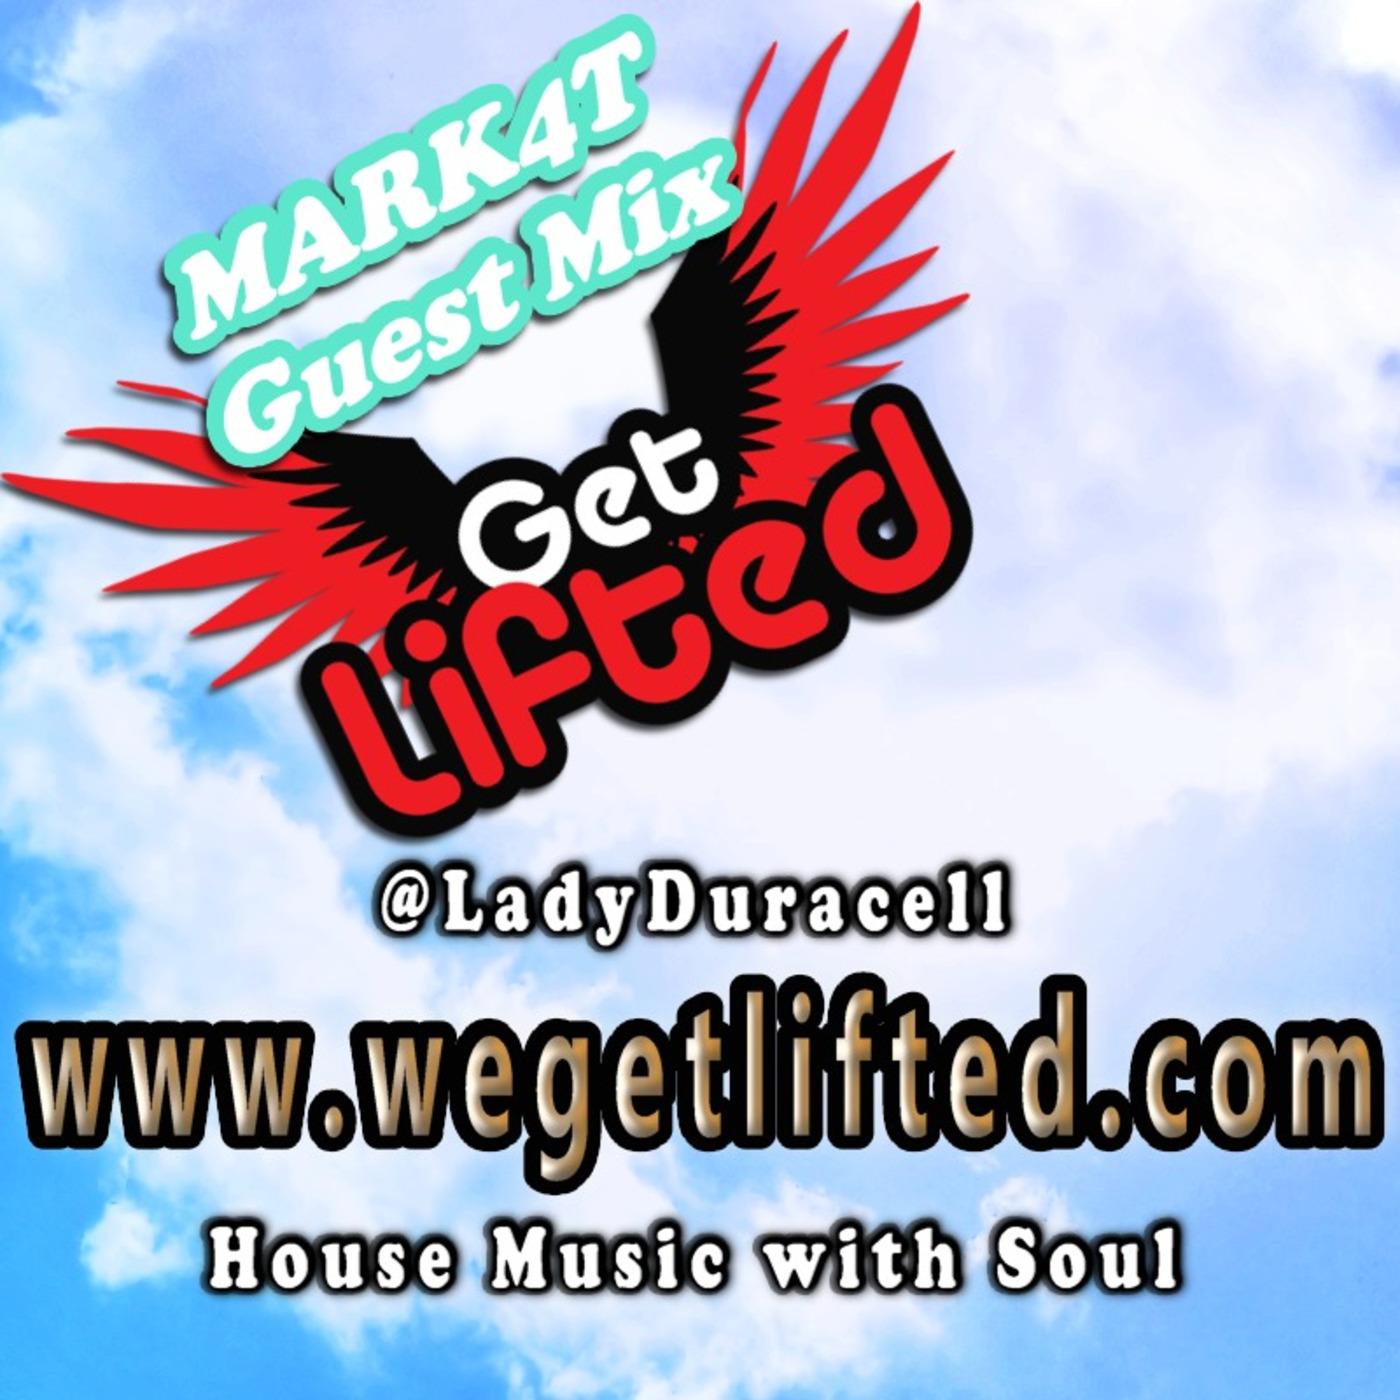 ladyduracell com http://www wegetlifted